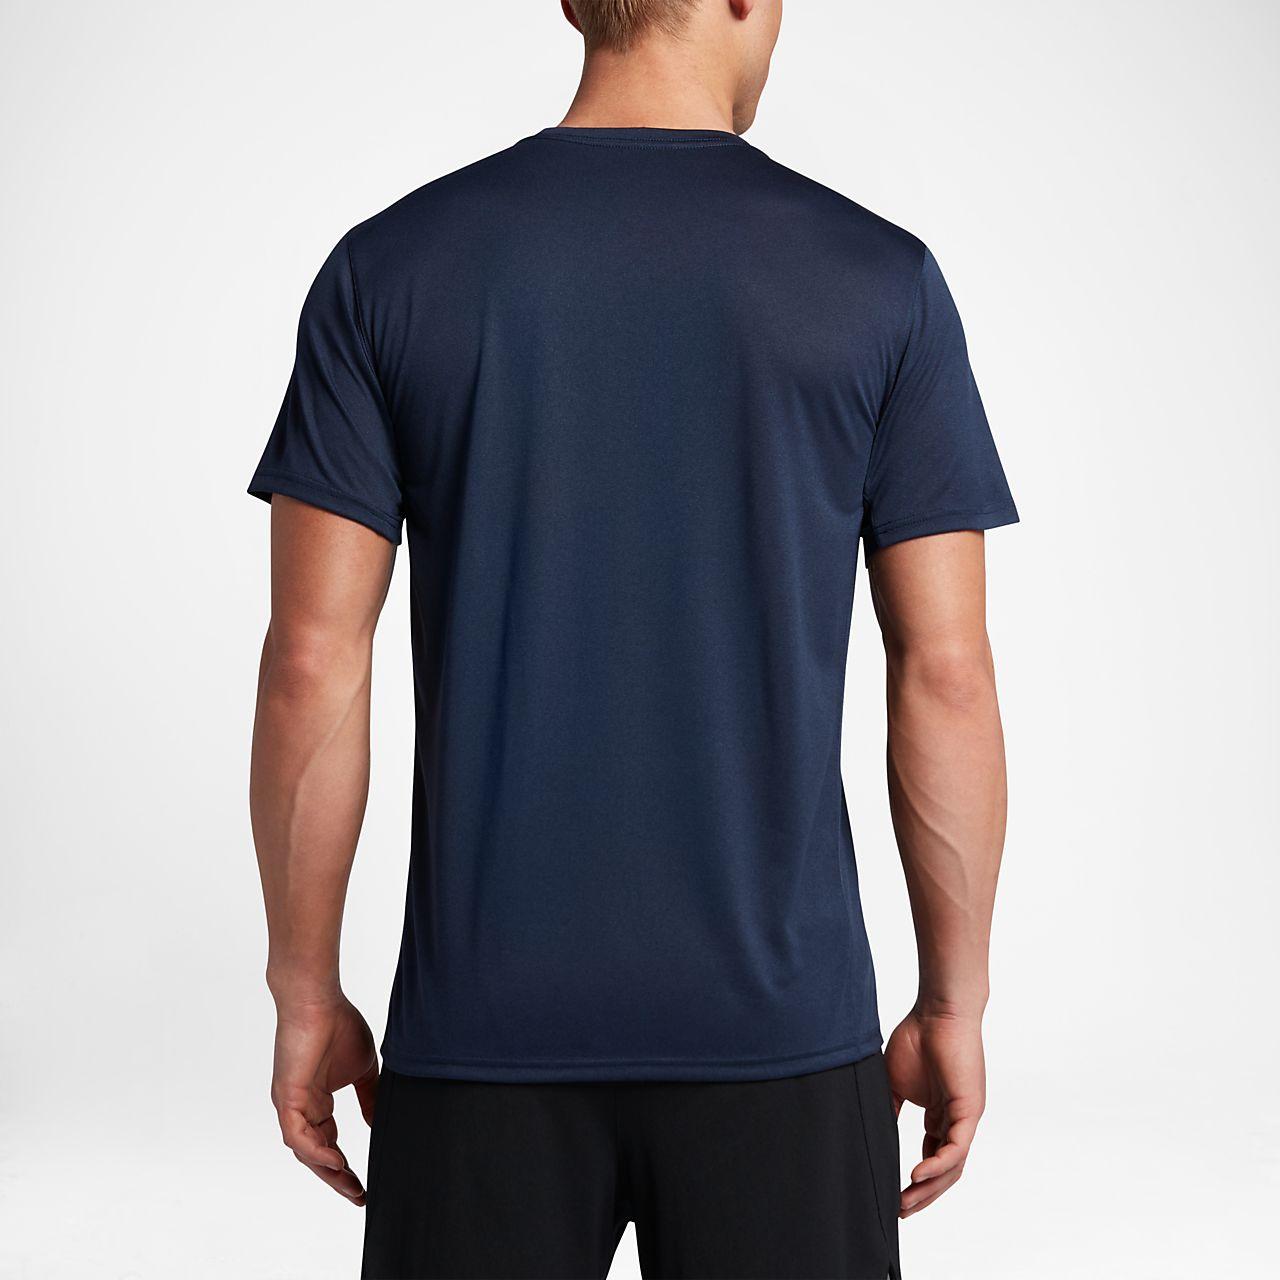 ... Nike Legend 2.0 Men's Training T-Shirt